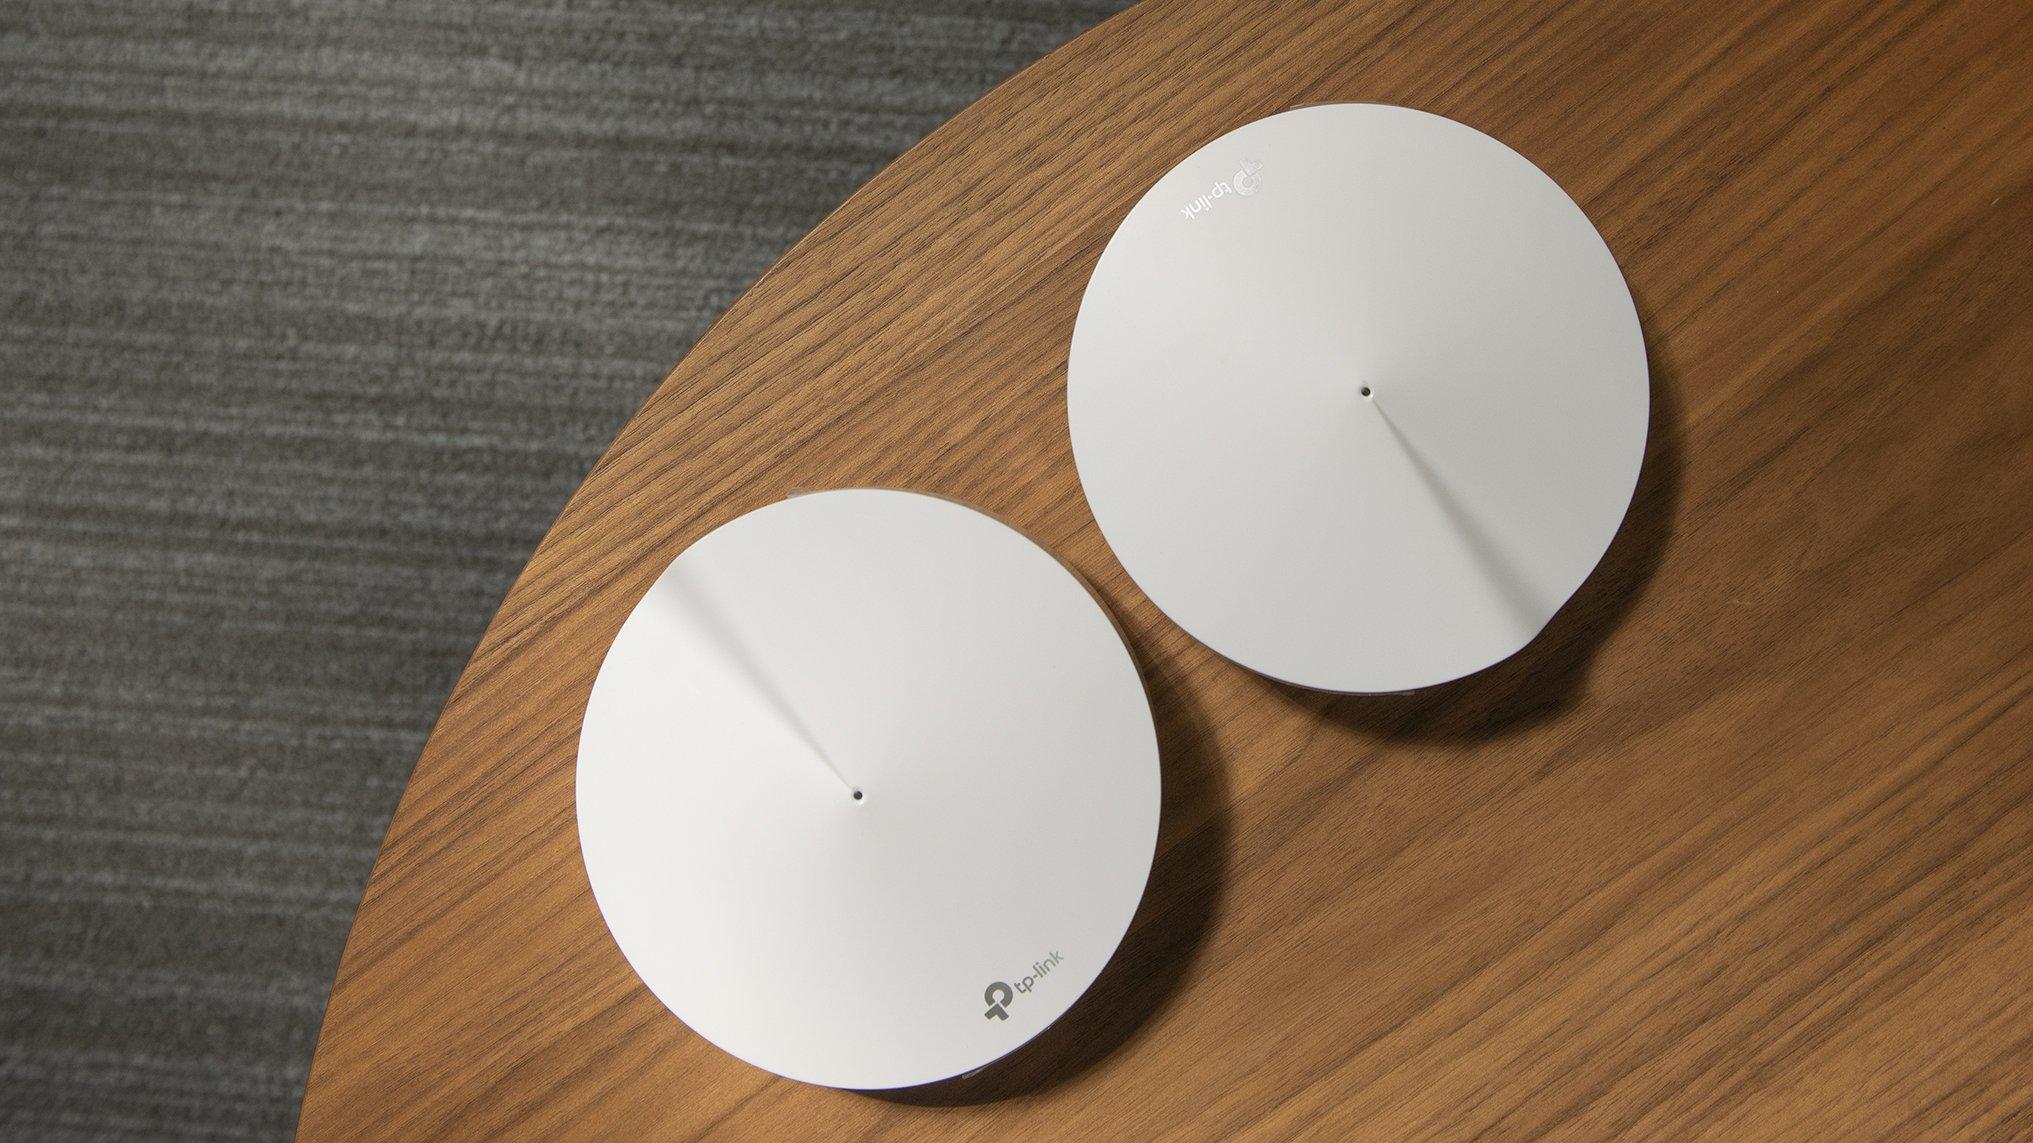 TP-Link Deco M9 Plus review: A fast, flexible mesh Wi-Fi system